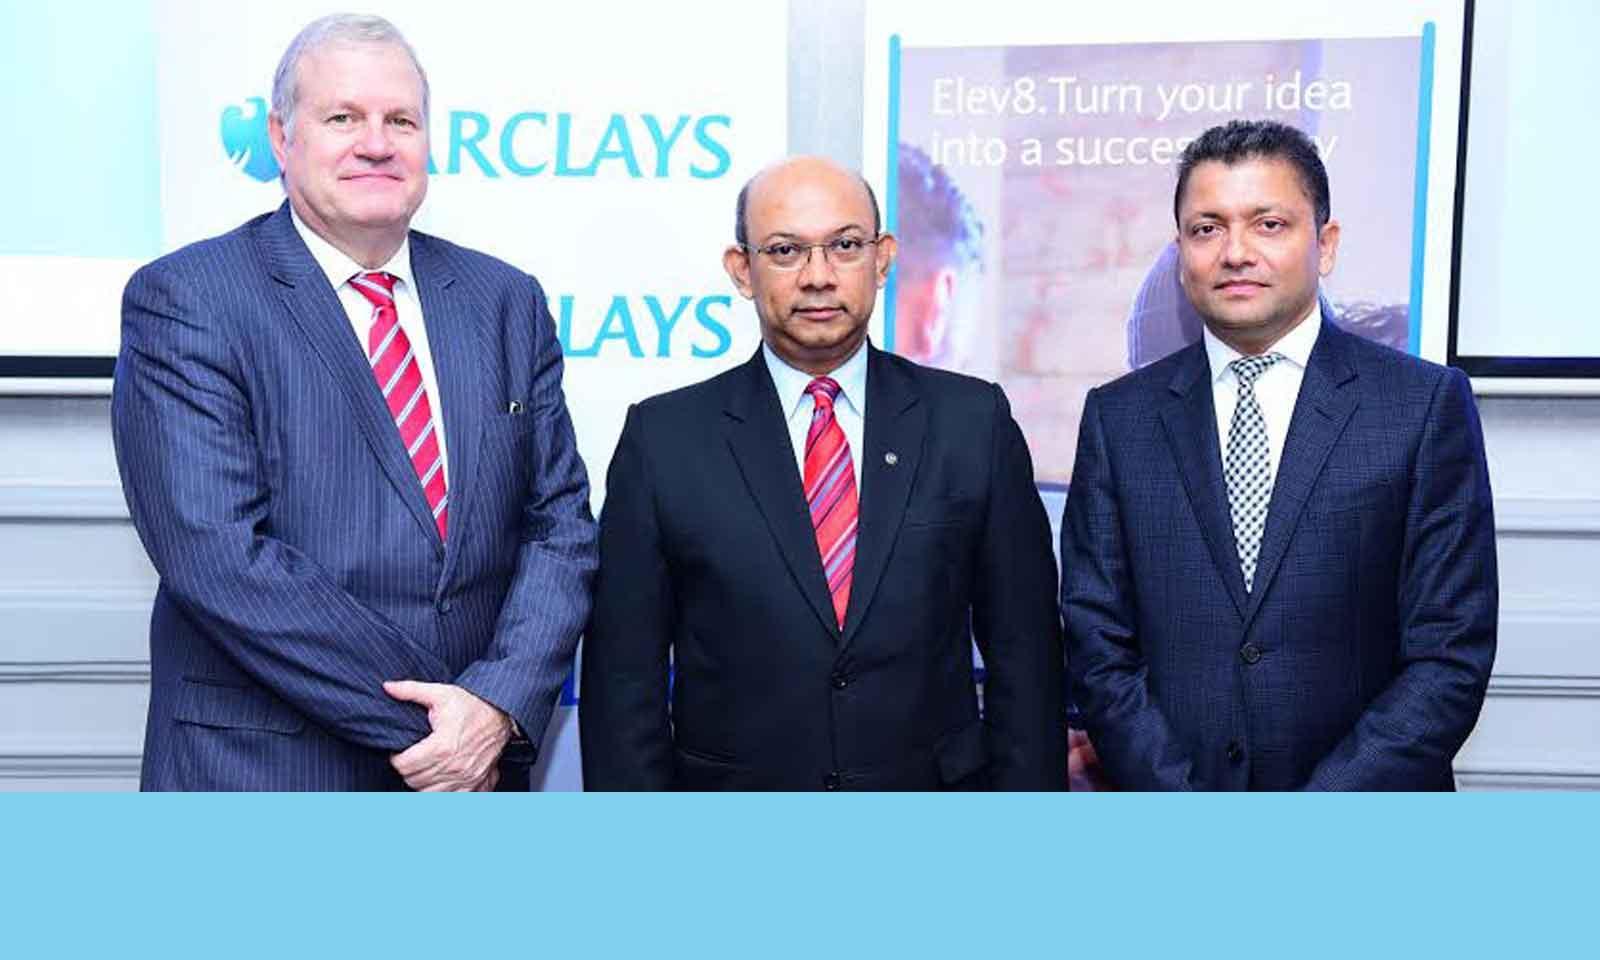 Barclays-Elev8-startup